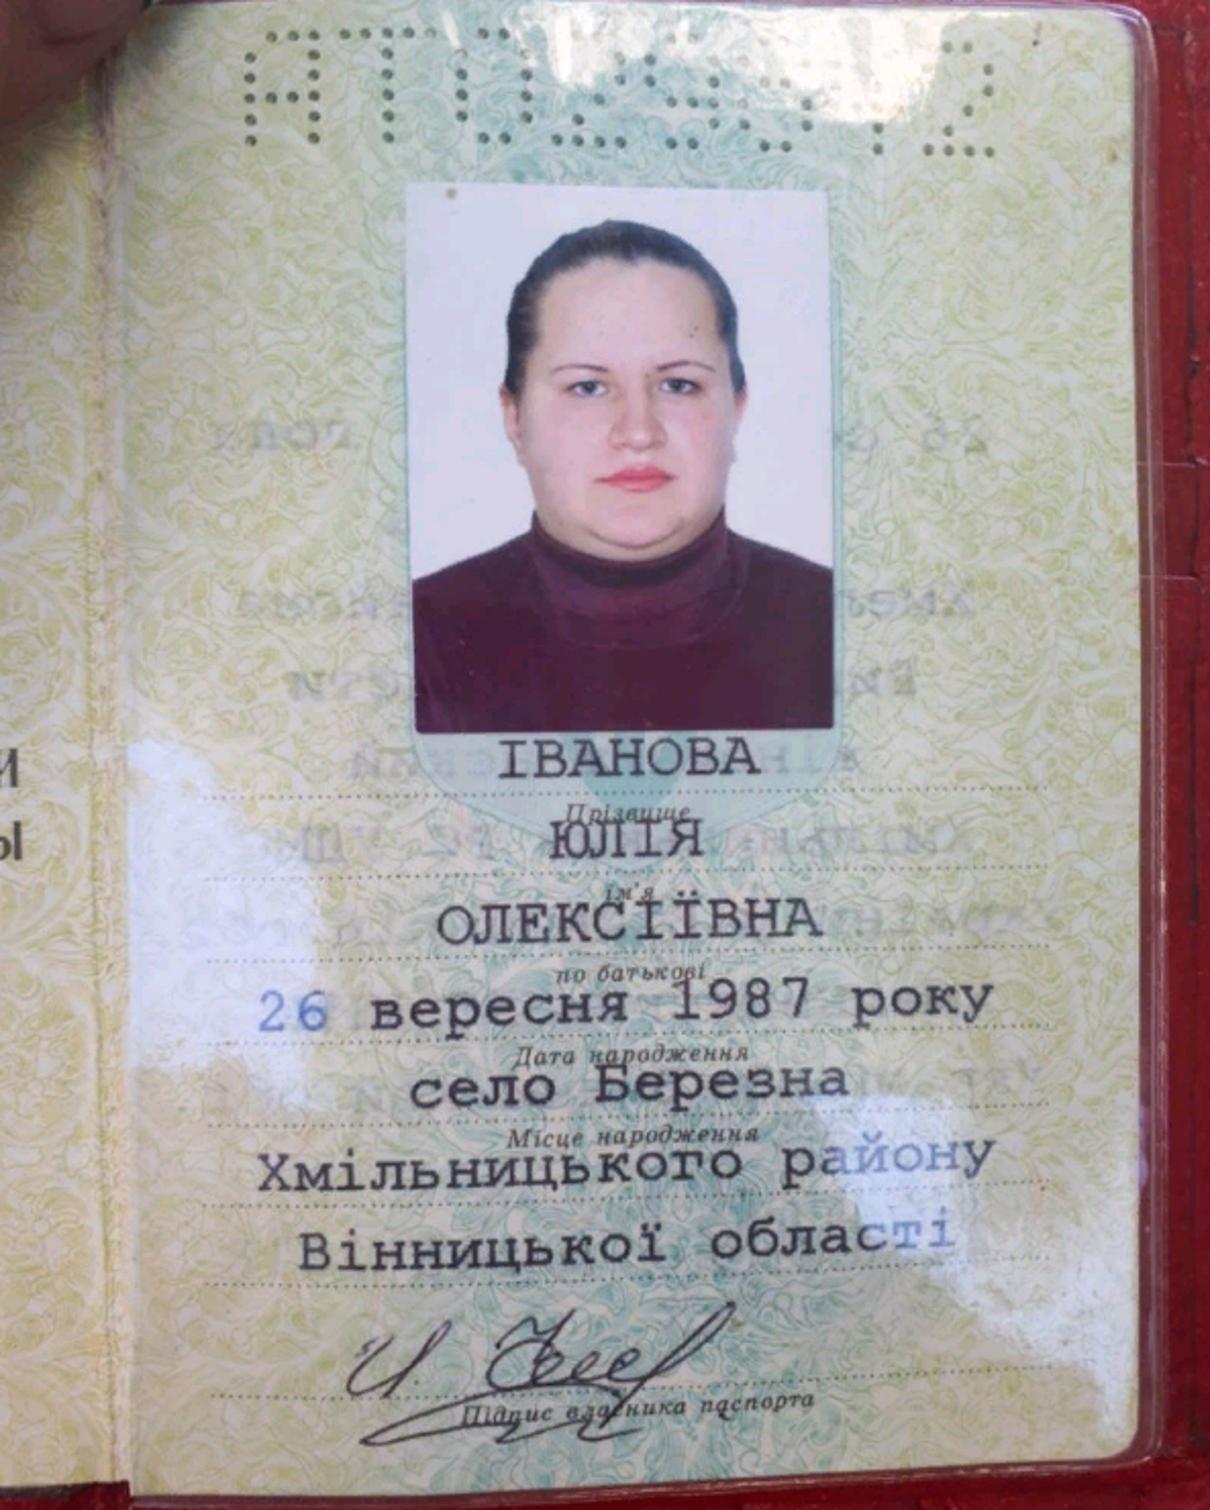 Жалоба-отзыв: Иванова Юлия Алексеевна 0634741066 - Мошенница